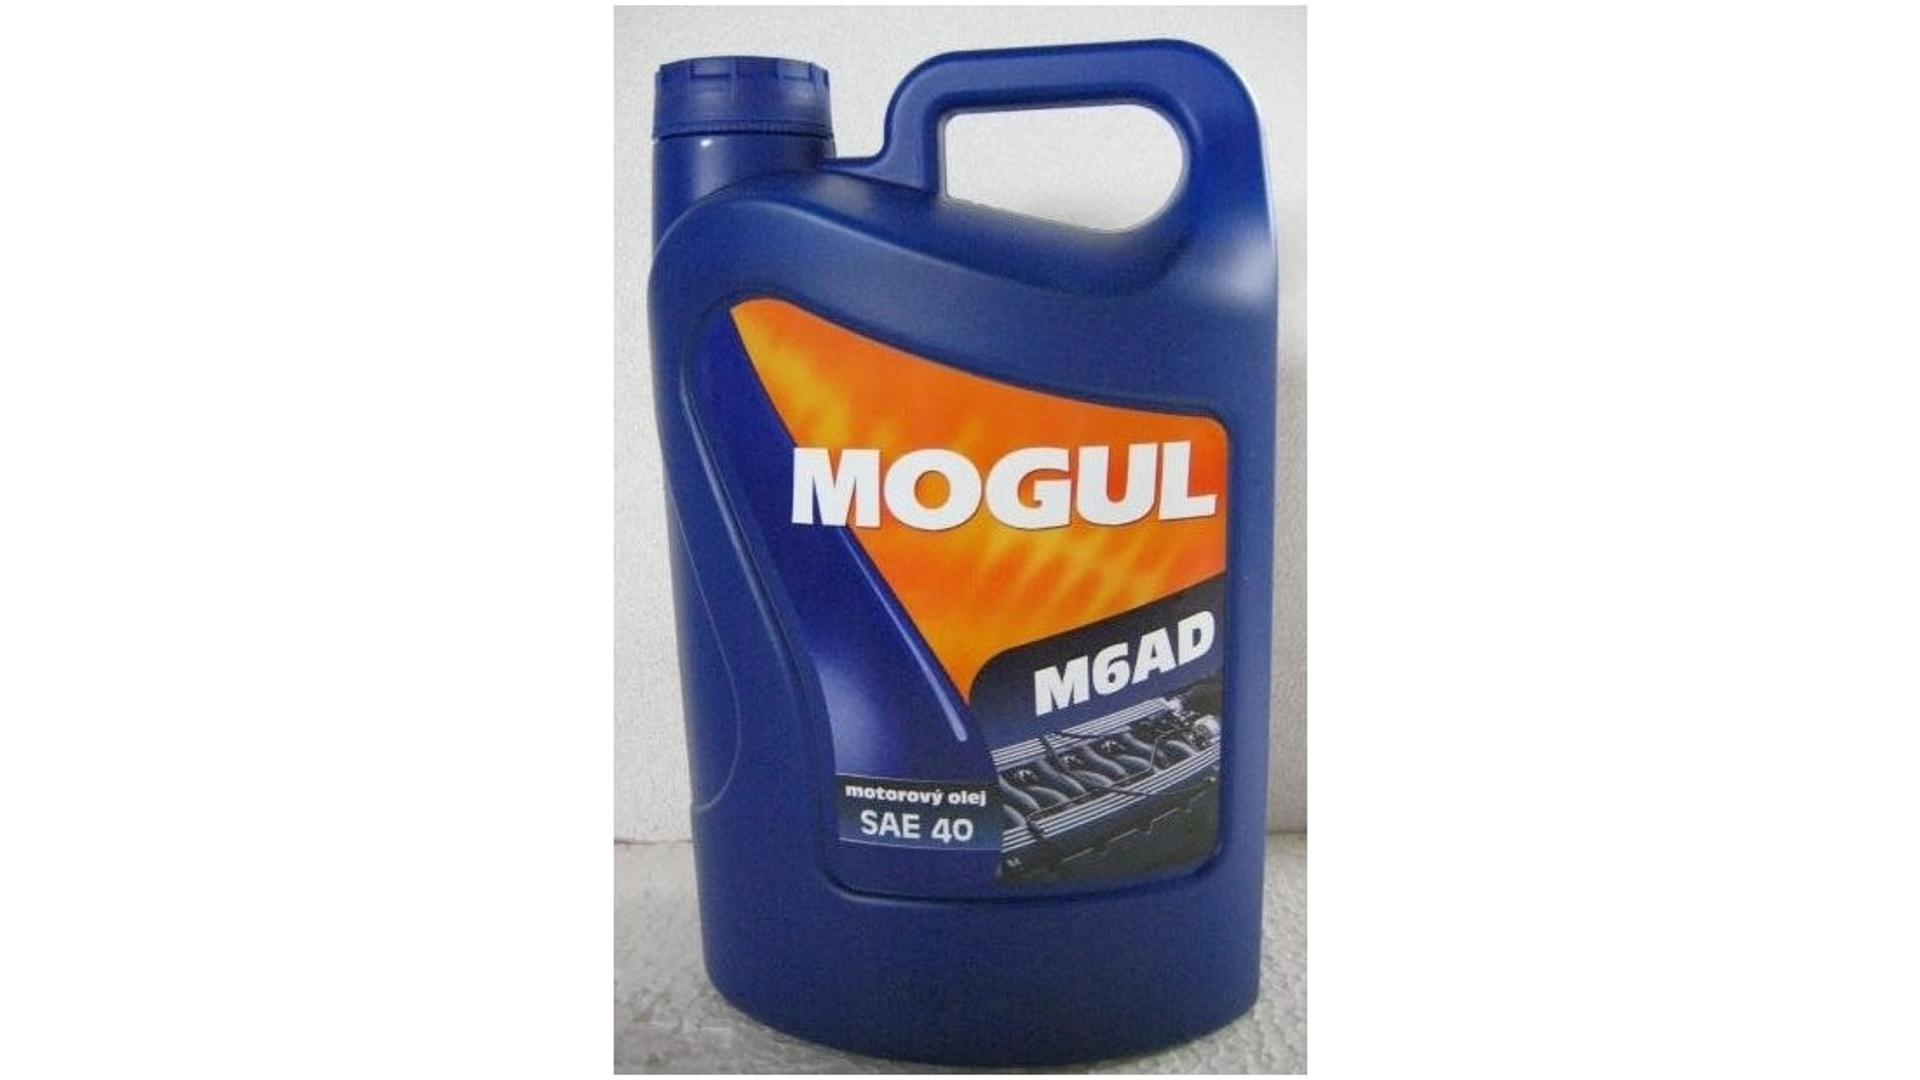 MOGUL M6AD (SAE40) /4L